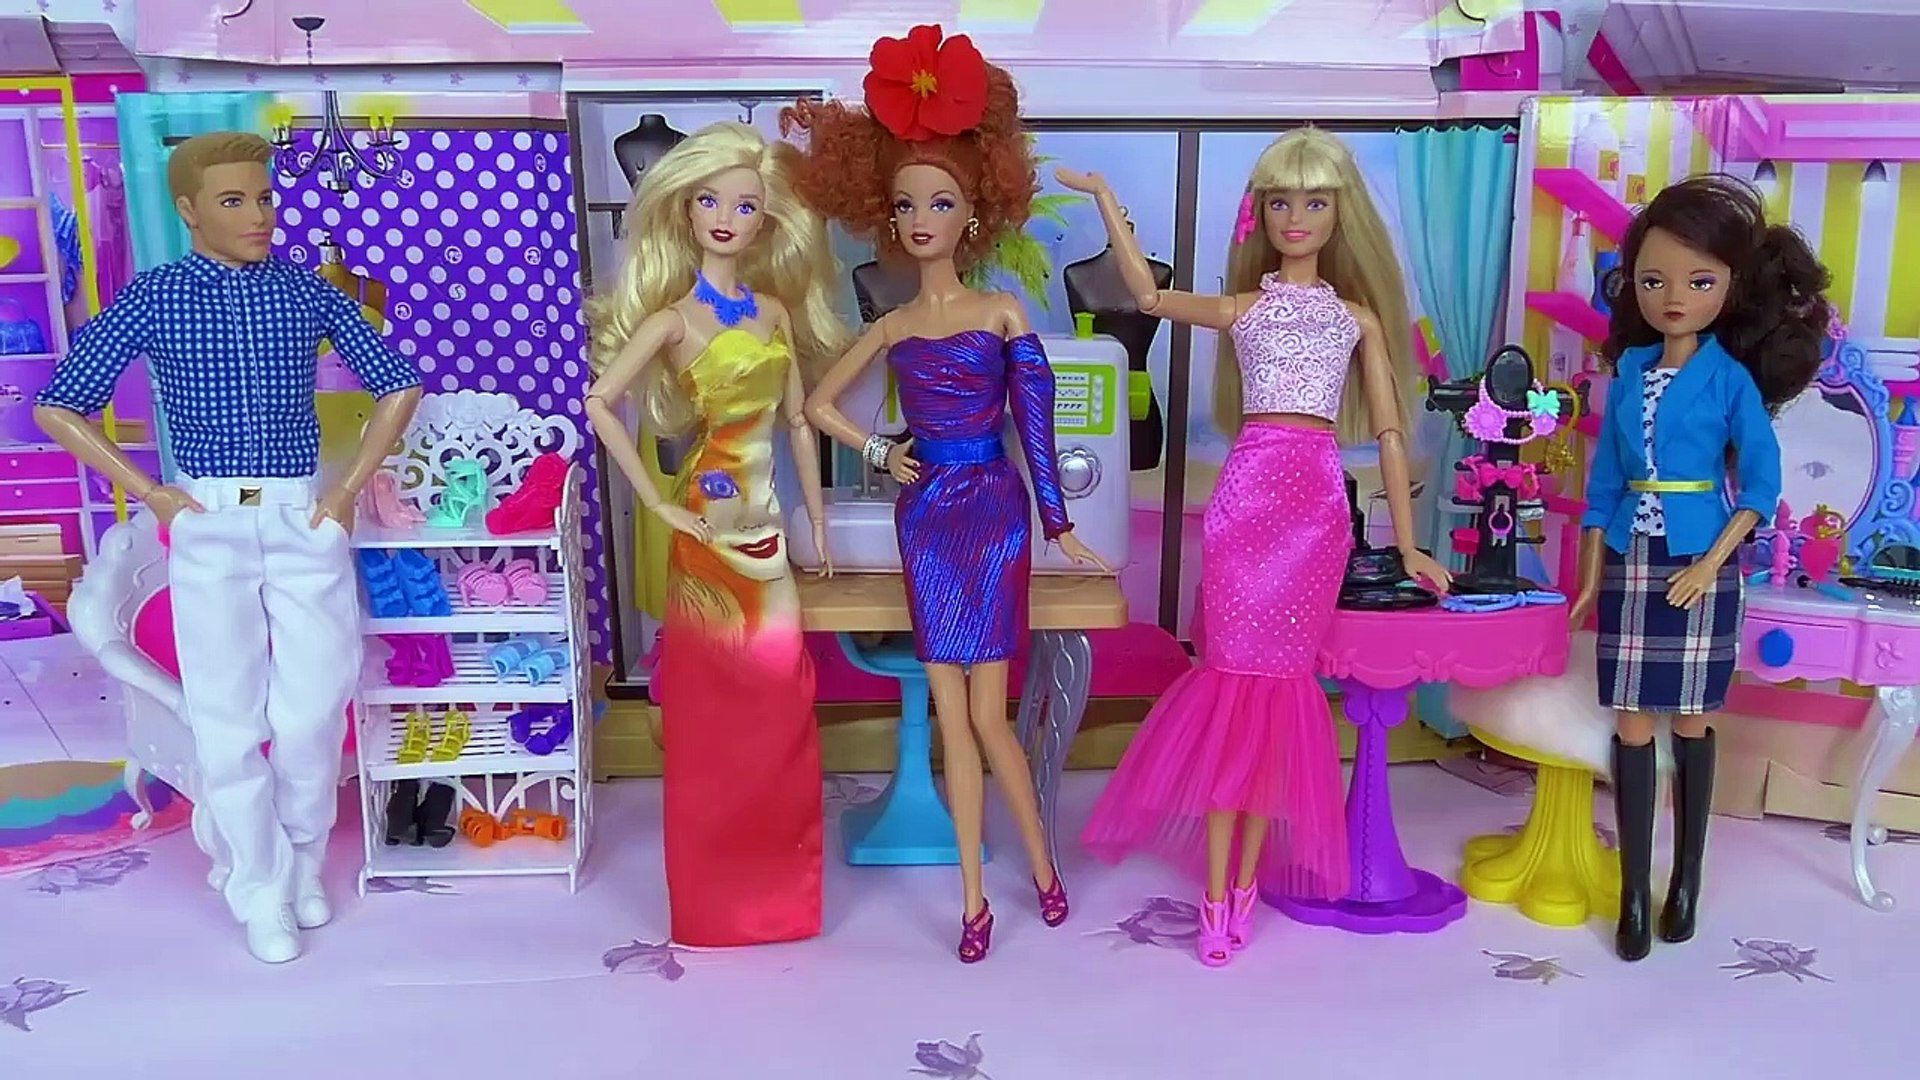 Barbie Girl and Ken Baby Dolls Fashion Beauty Salon!